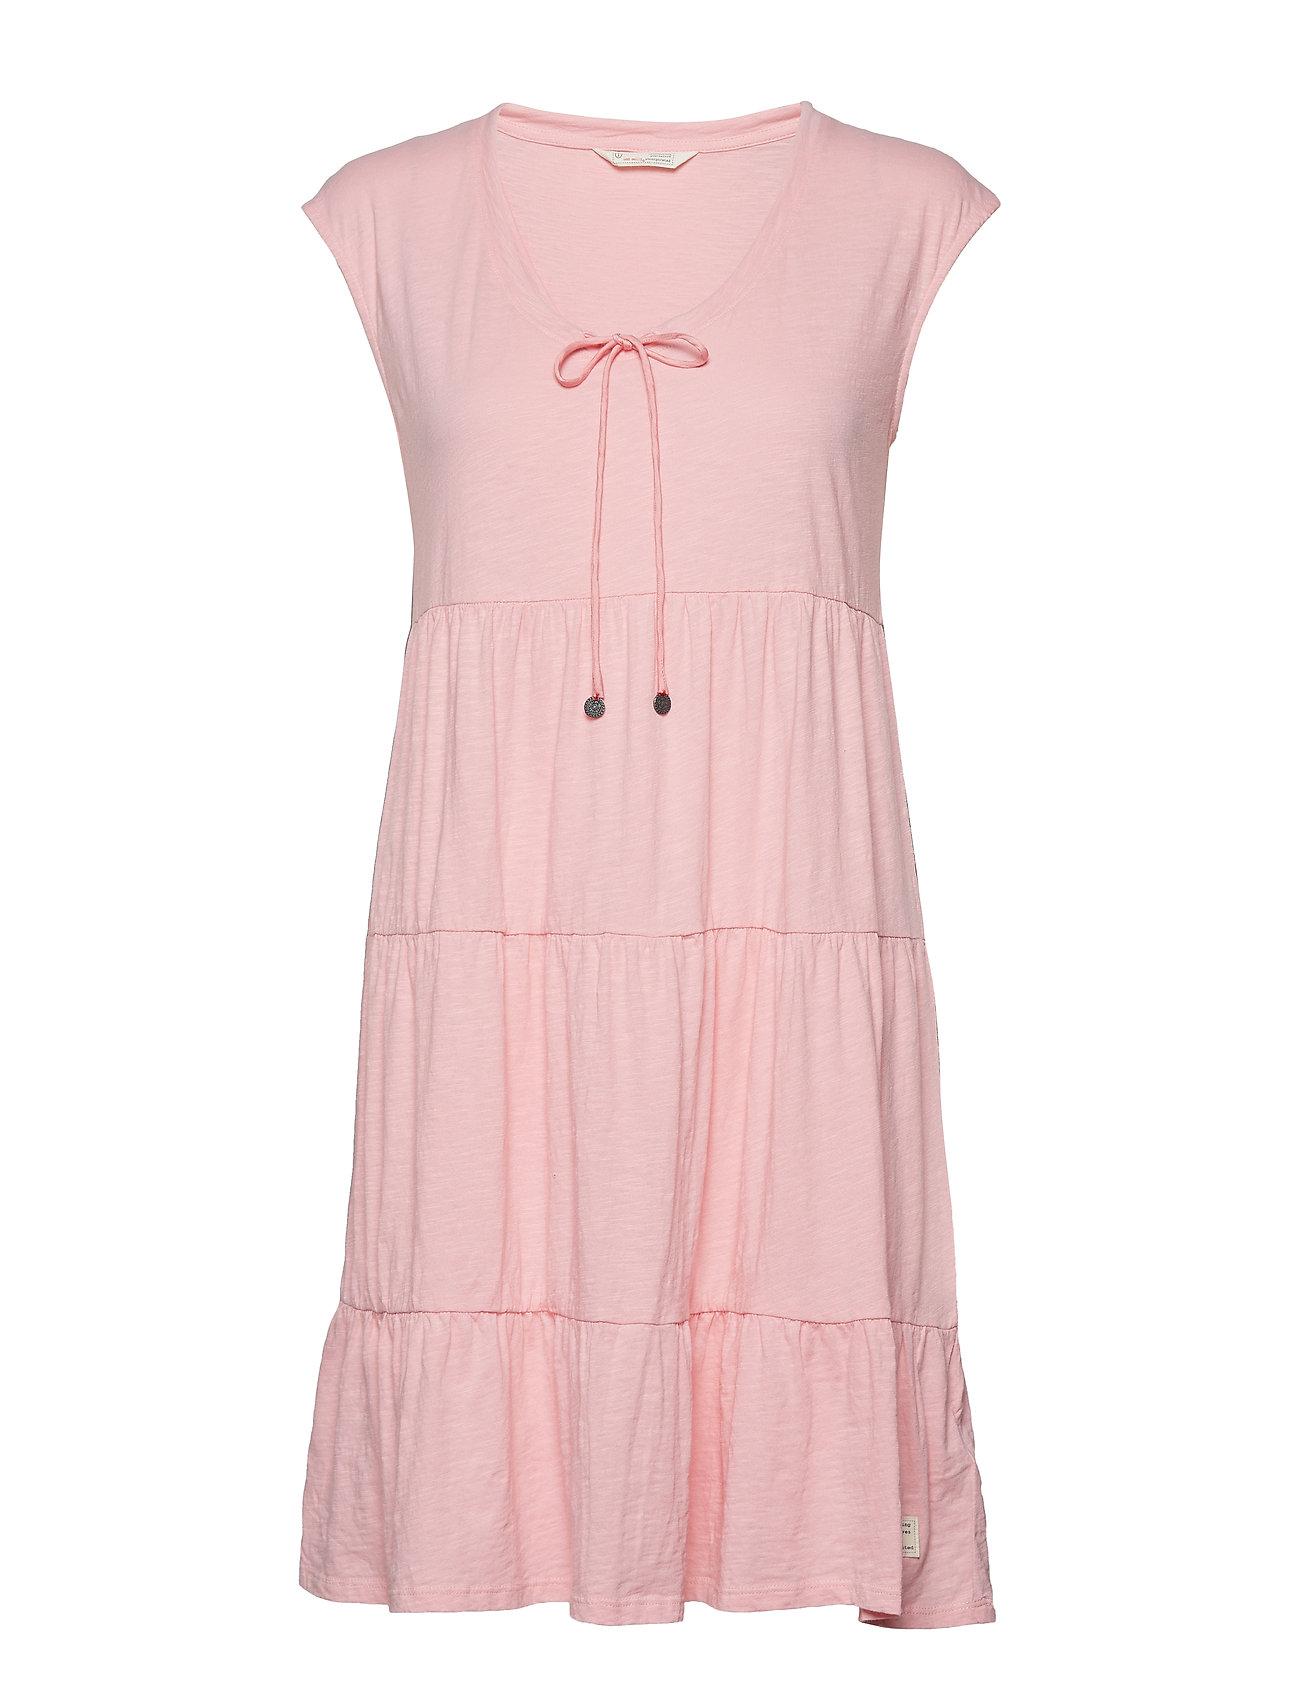 ODD MOLLY groove romance s/s dress